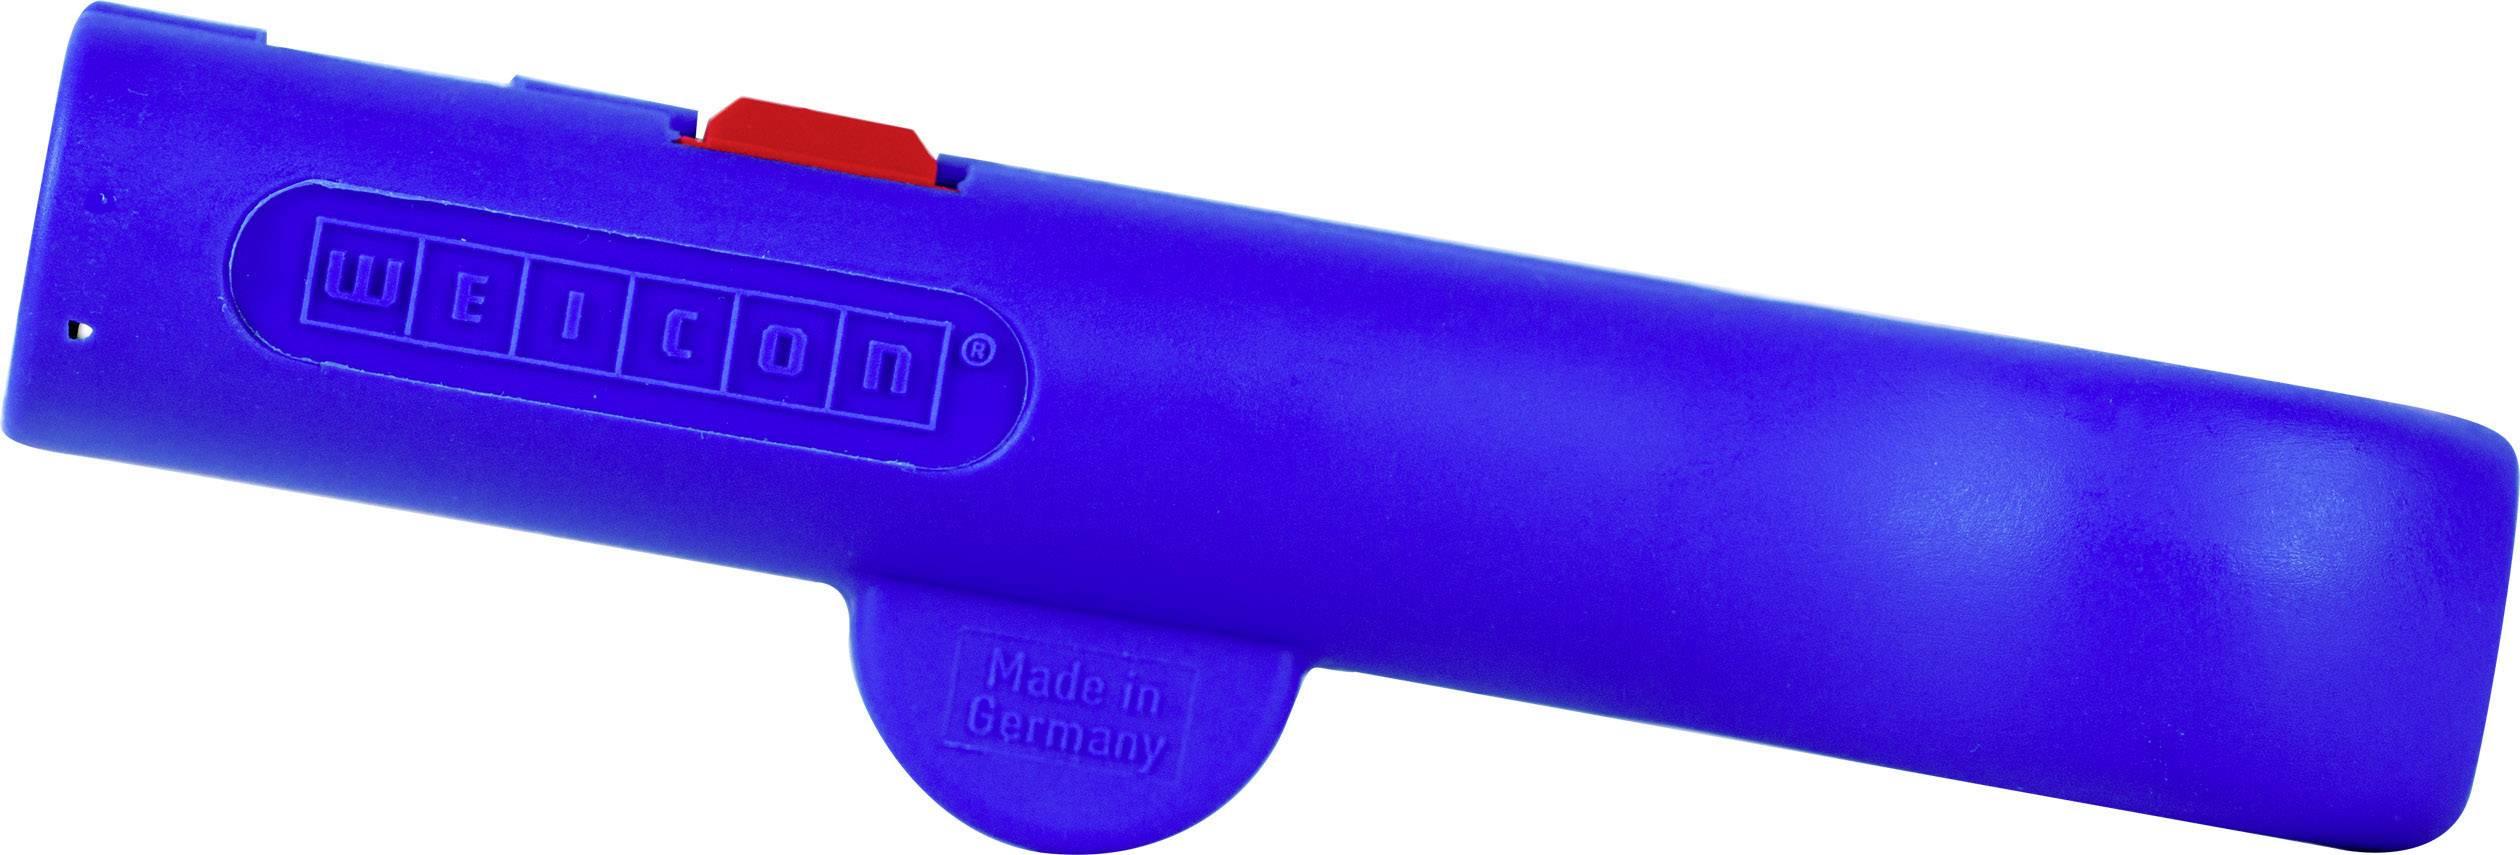 KingBra 1,0 mm Hartmetall-Schaftfr/äser CNC-Fr/äser Fr/äser Endfr/äser mit hoher Pr/äzision Hartmetall einschneidende Aluminium-Schneidfr/äser f/ür PCB-Maschine